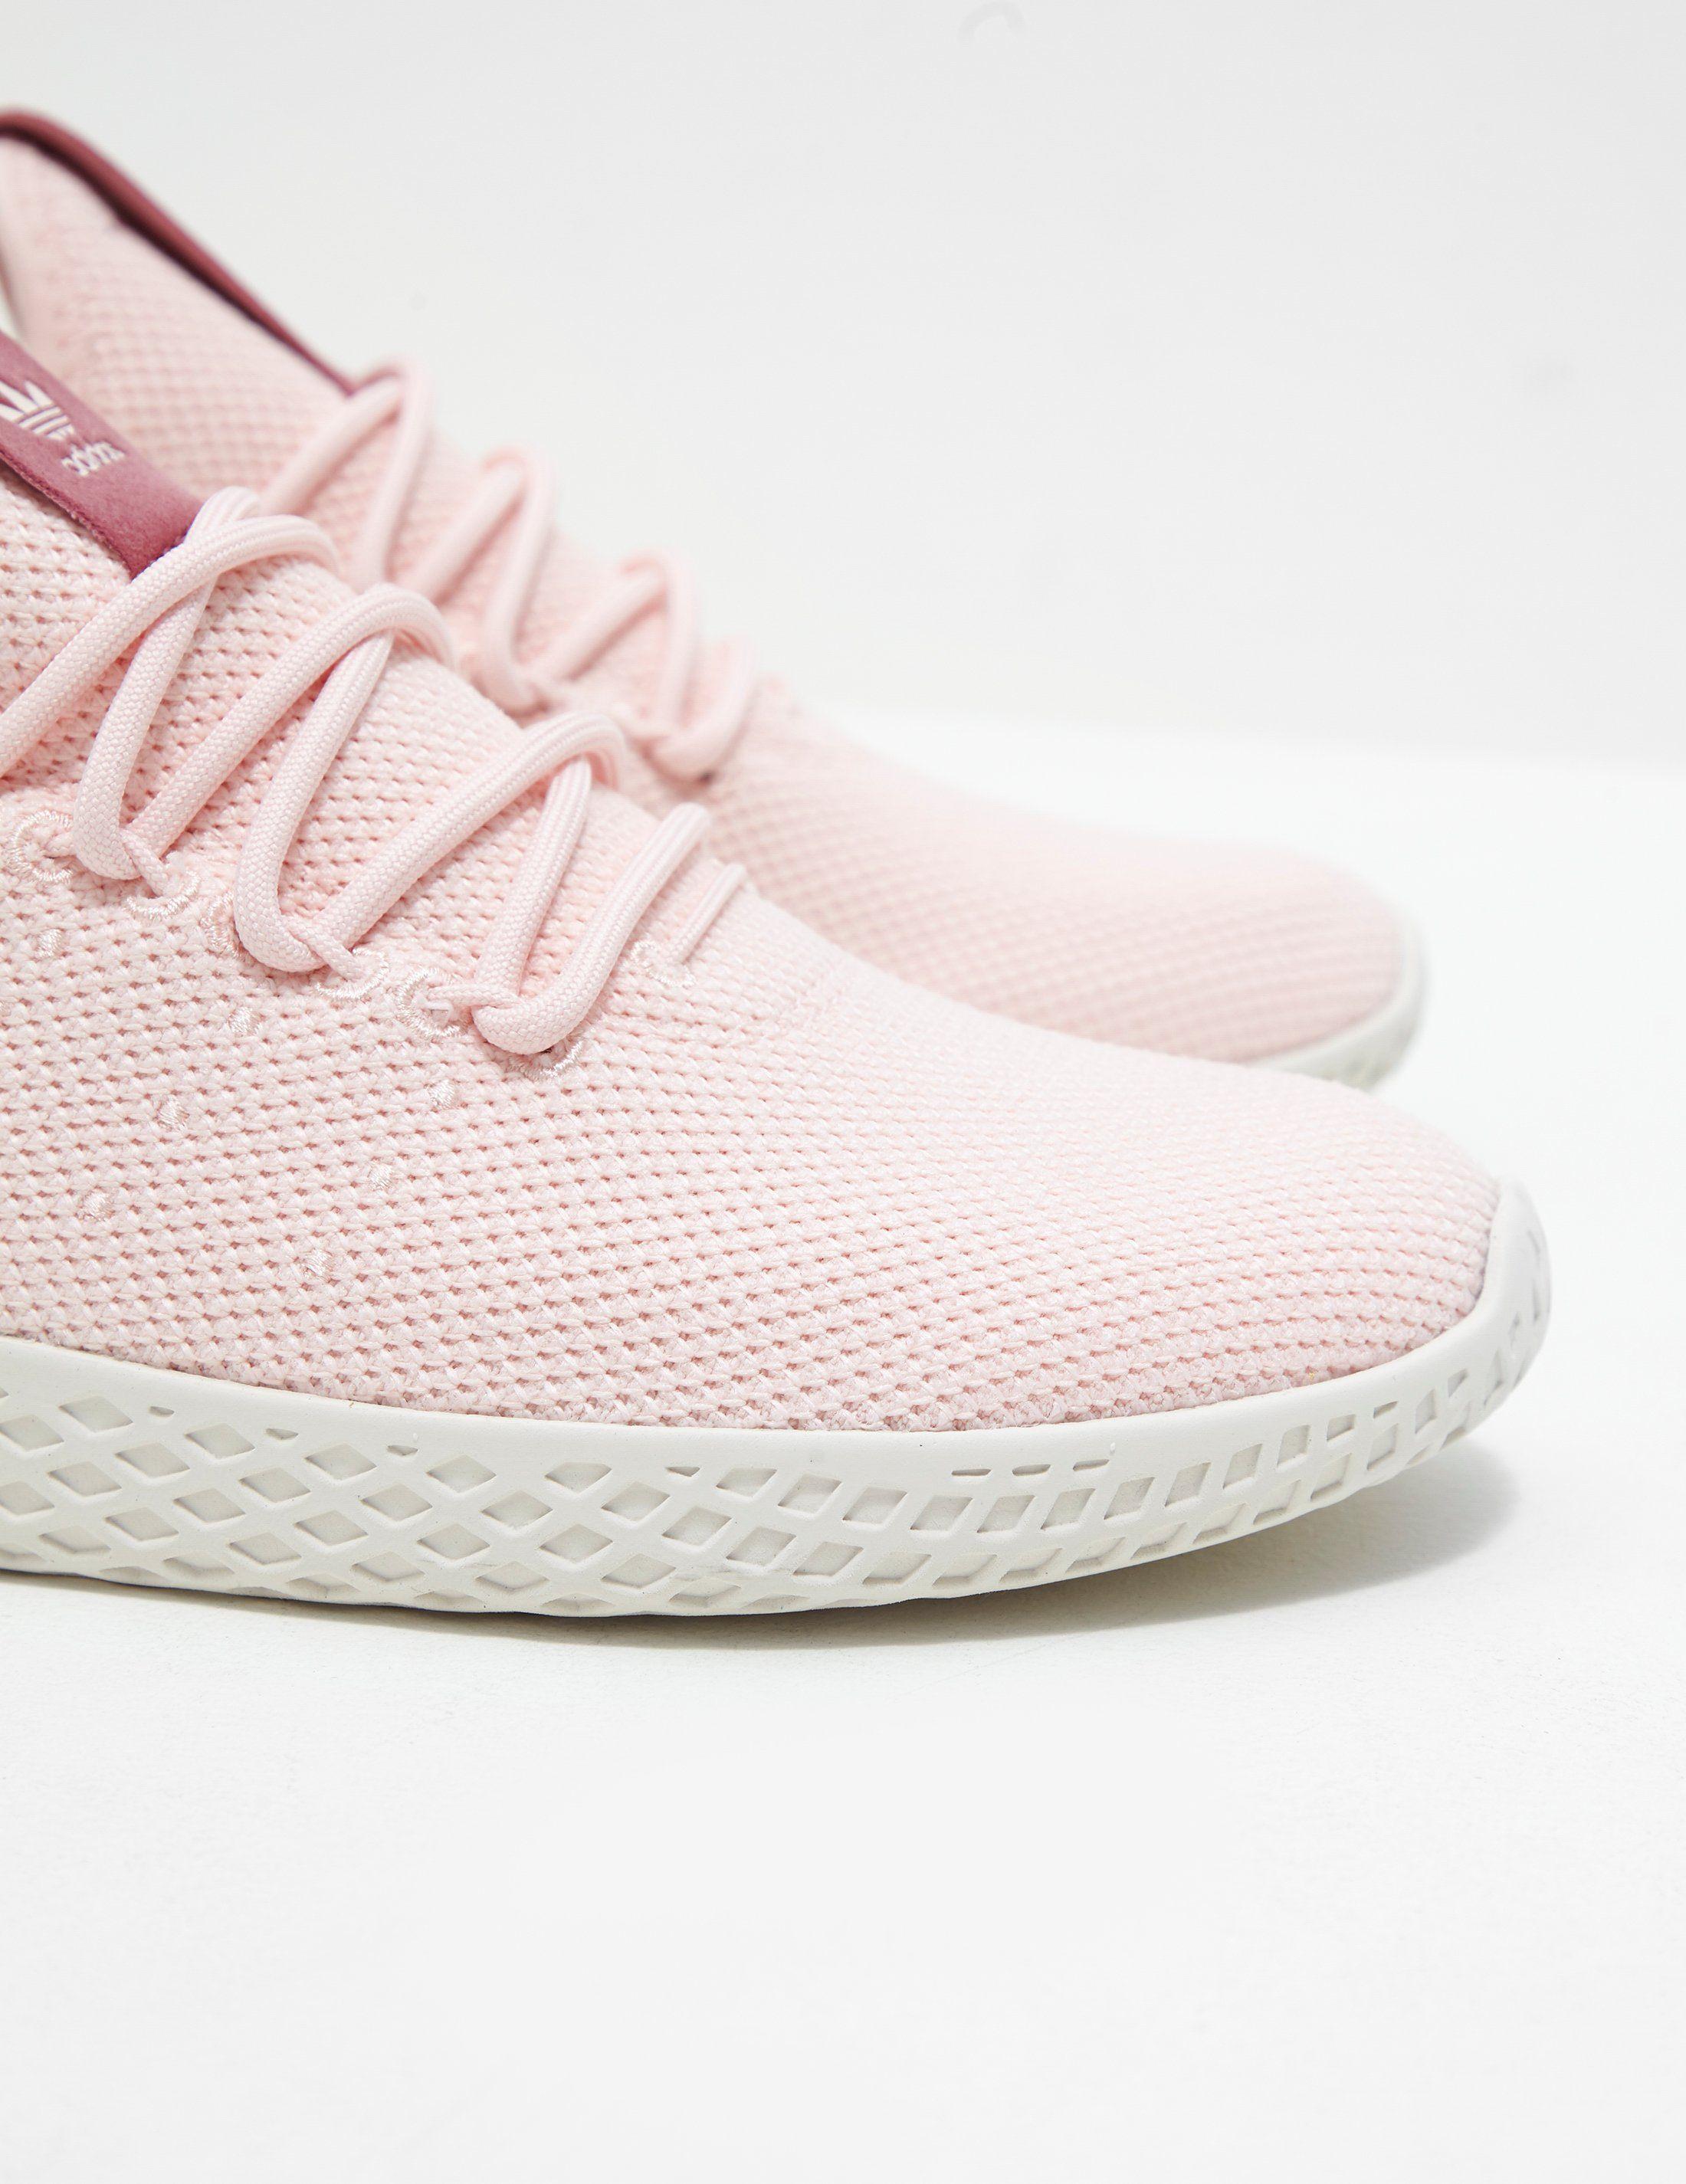 adidas Originals x Pharrell Williams Tennis HU Trainers